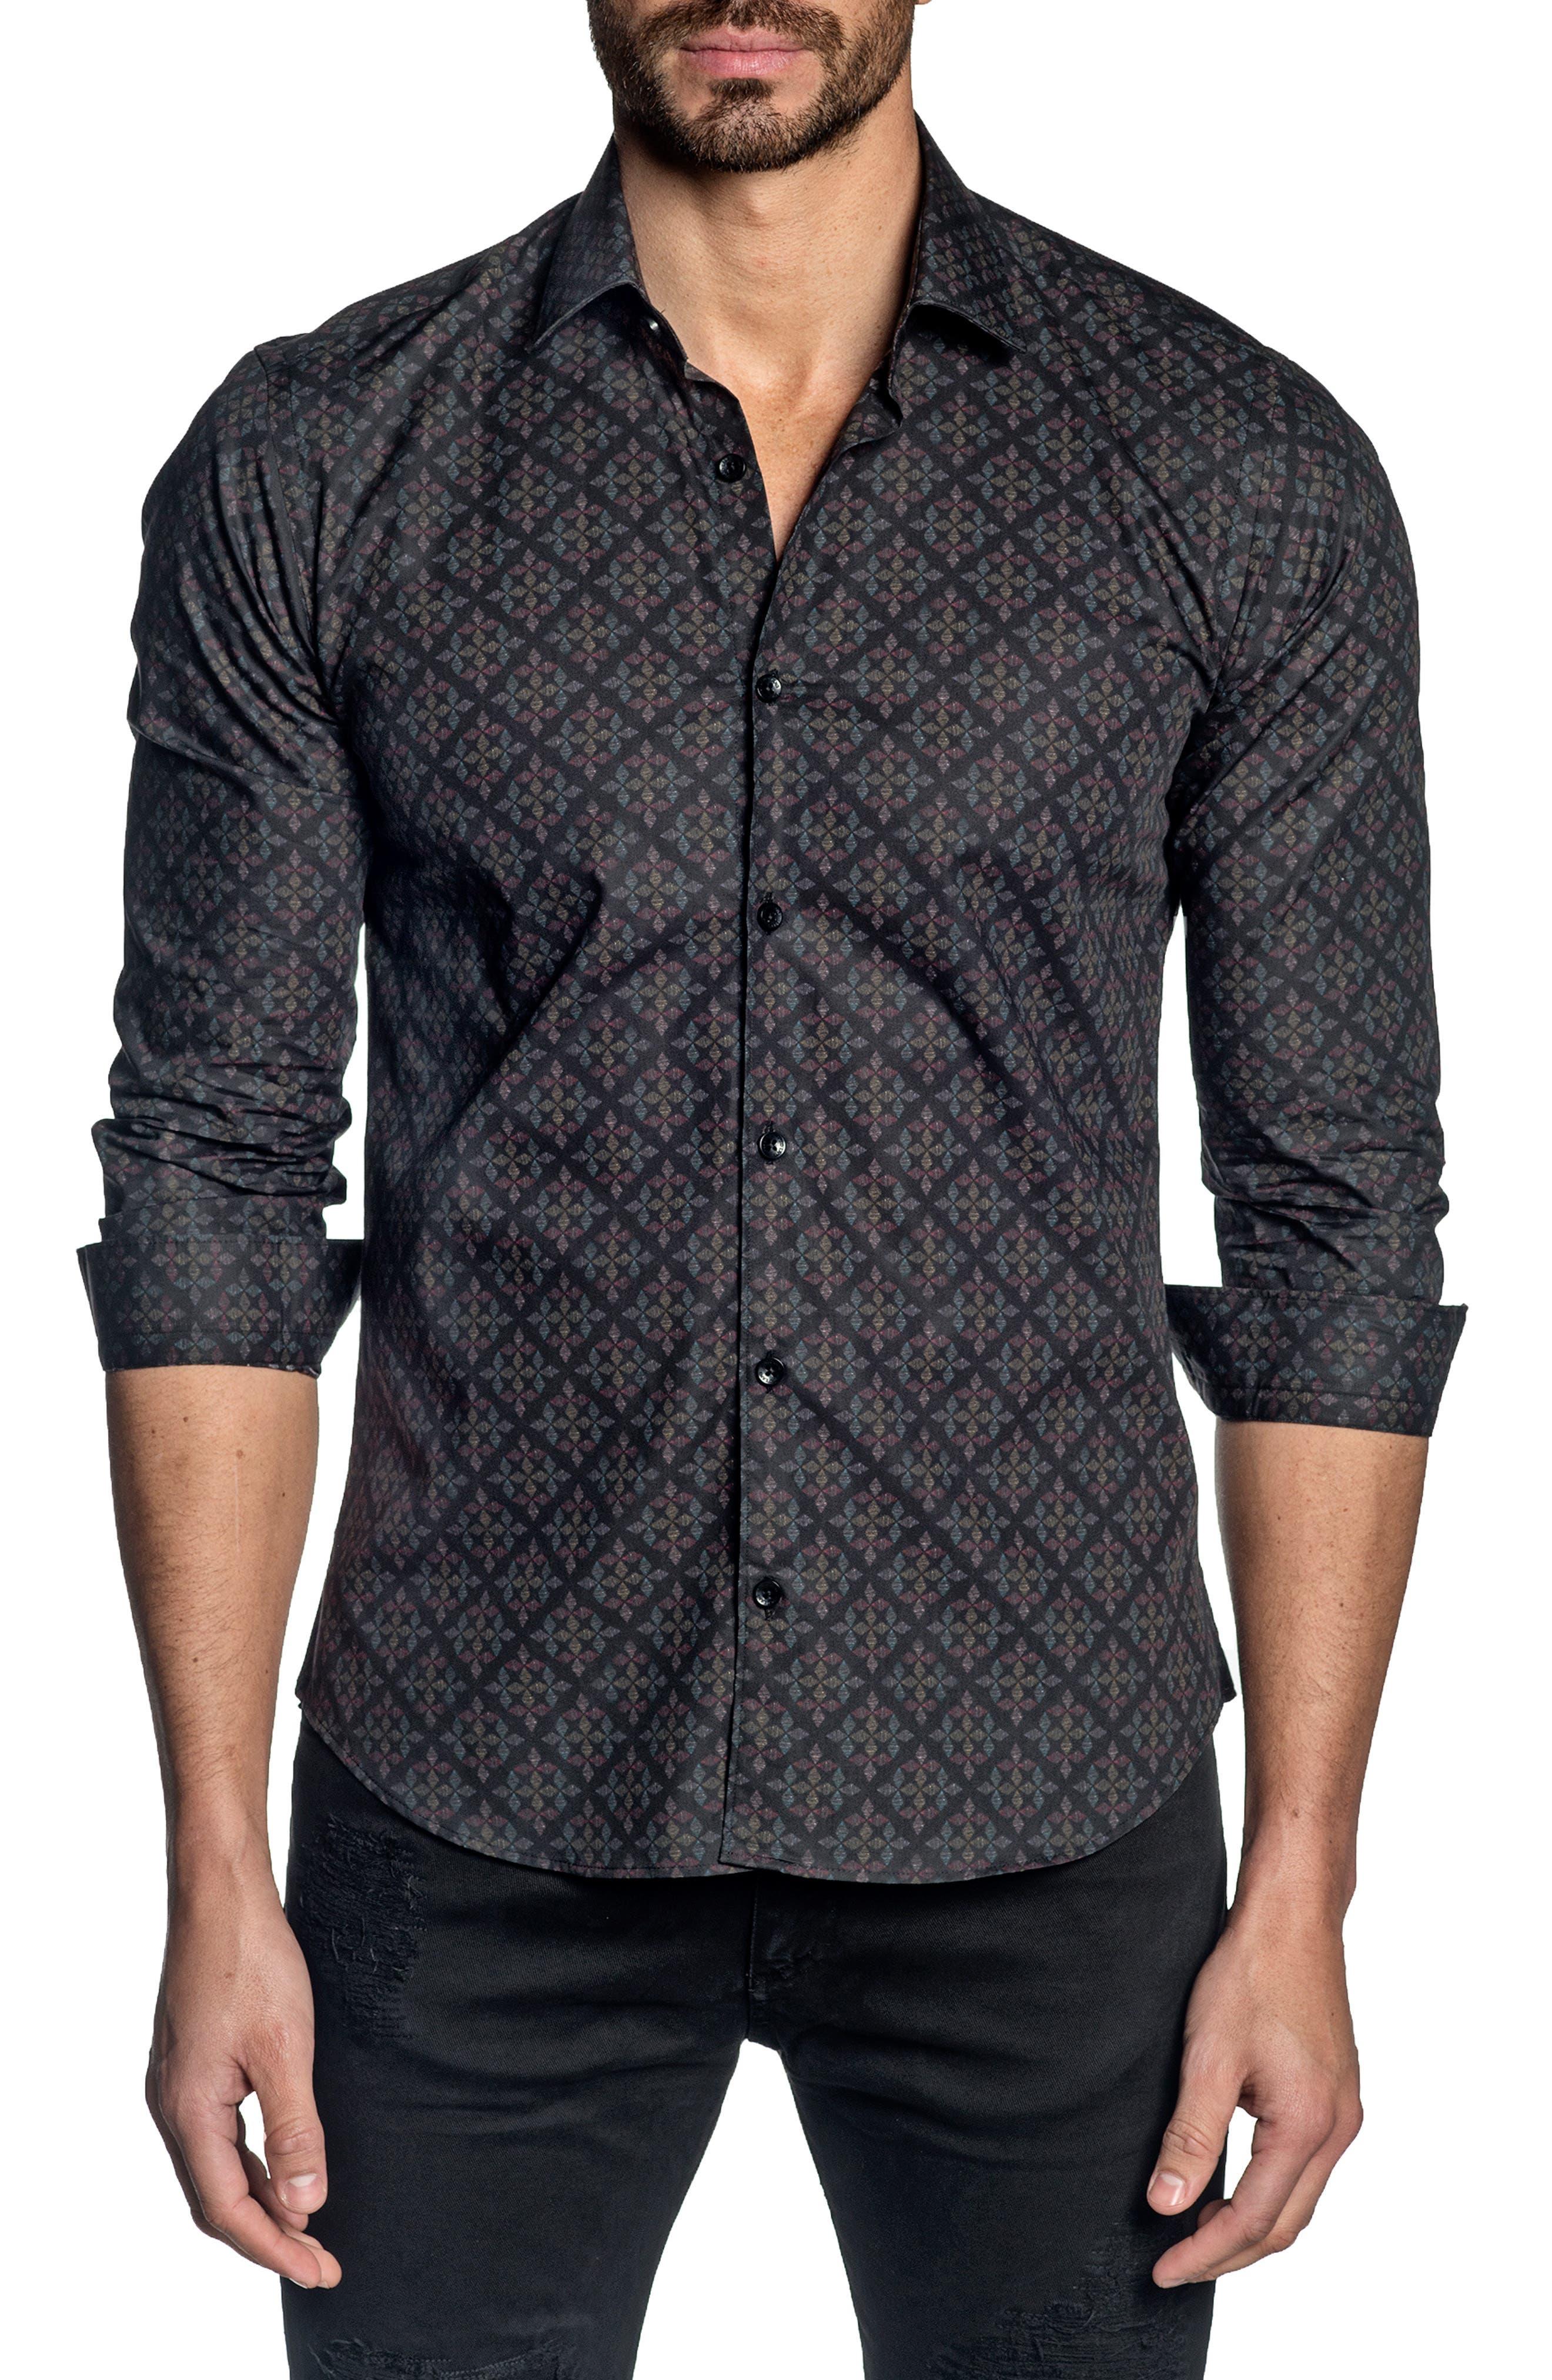 Trim Fit Button-Up Shirt